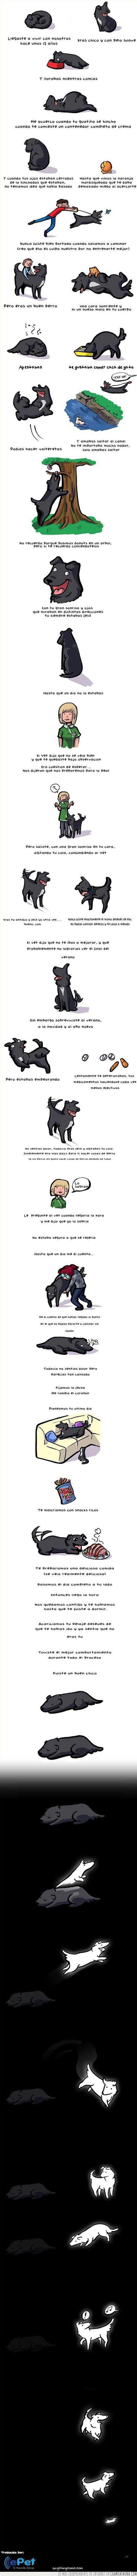 amor,comer,crecer,enfermar,morir,muerte,nadar,perro,vida,vivir